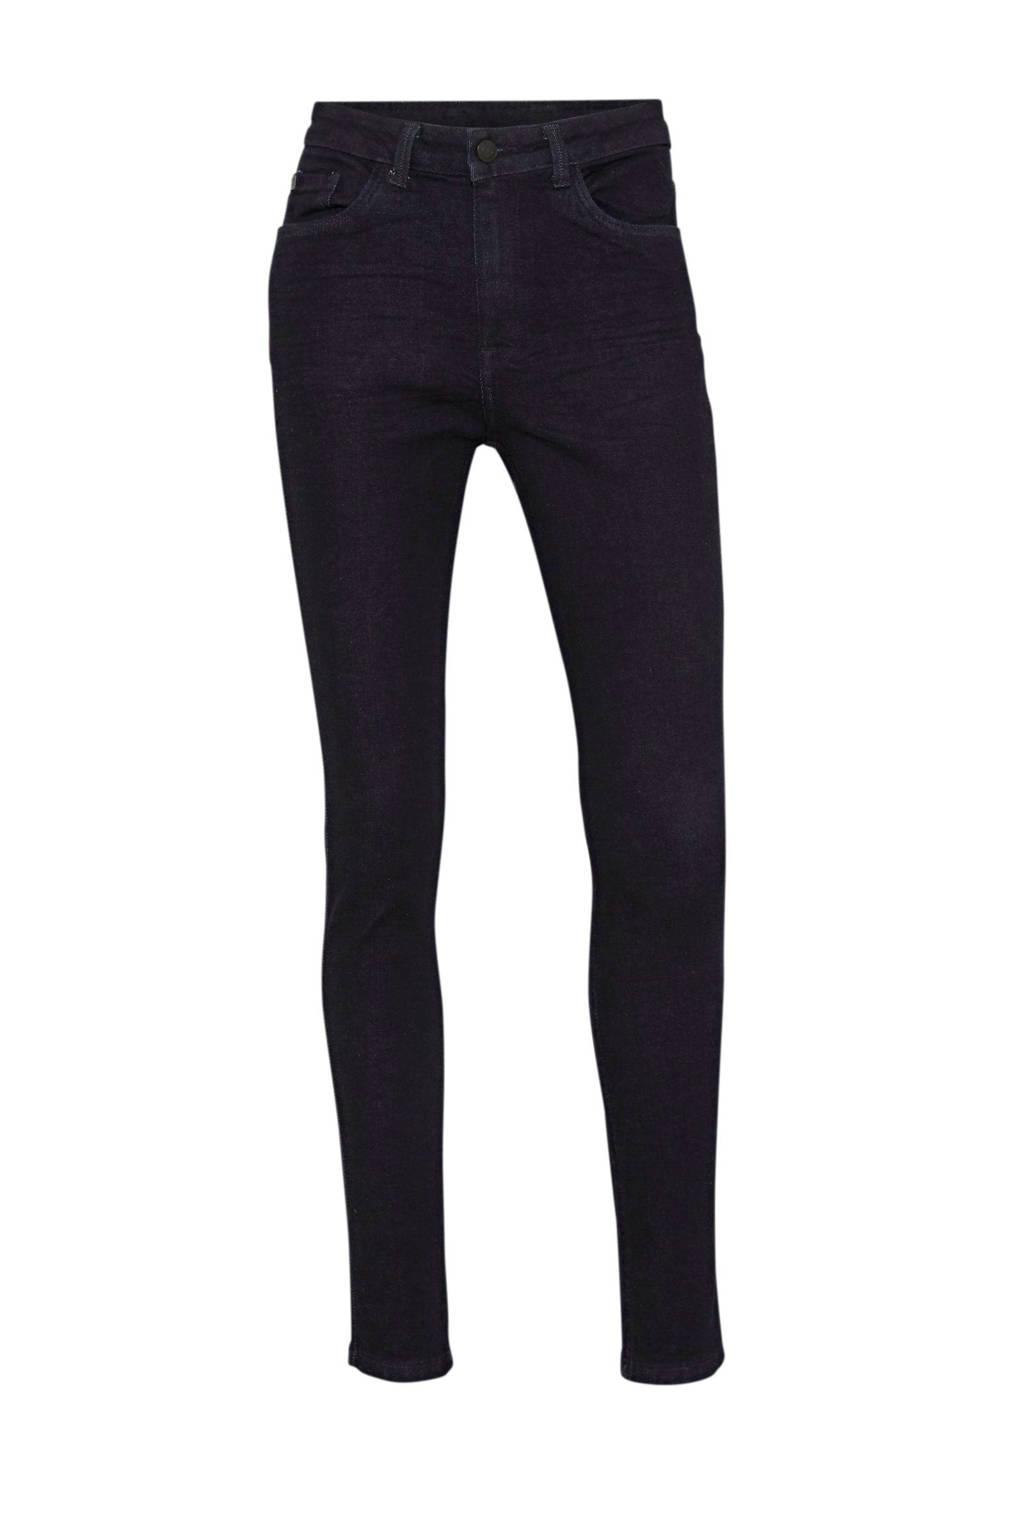 C&A The Denim high waist skinny jeans met biologisch katoen donkerblauw, Donkerblauw